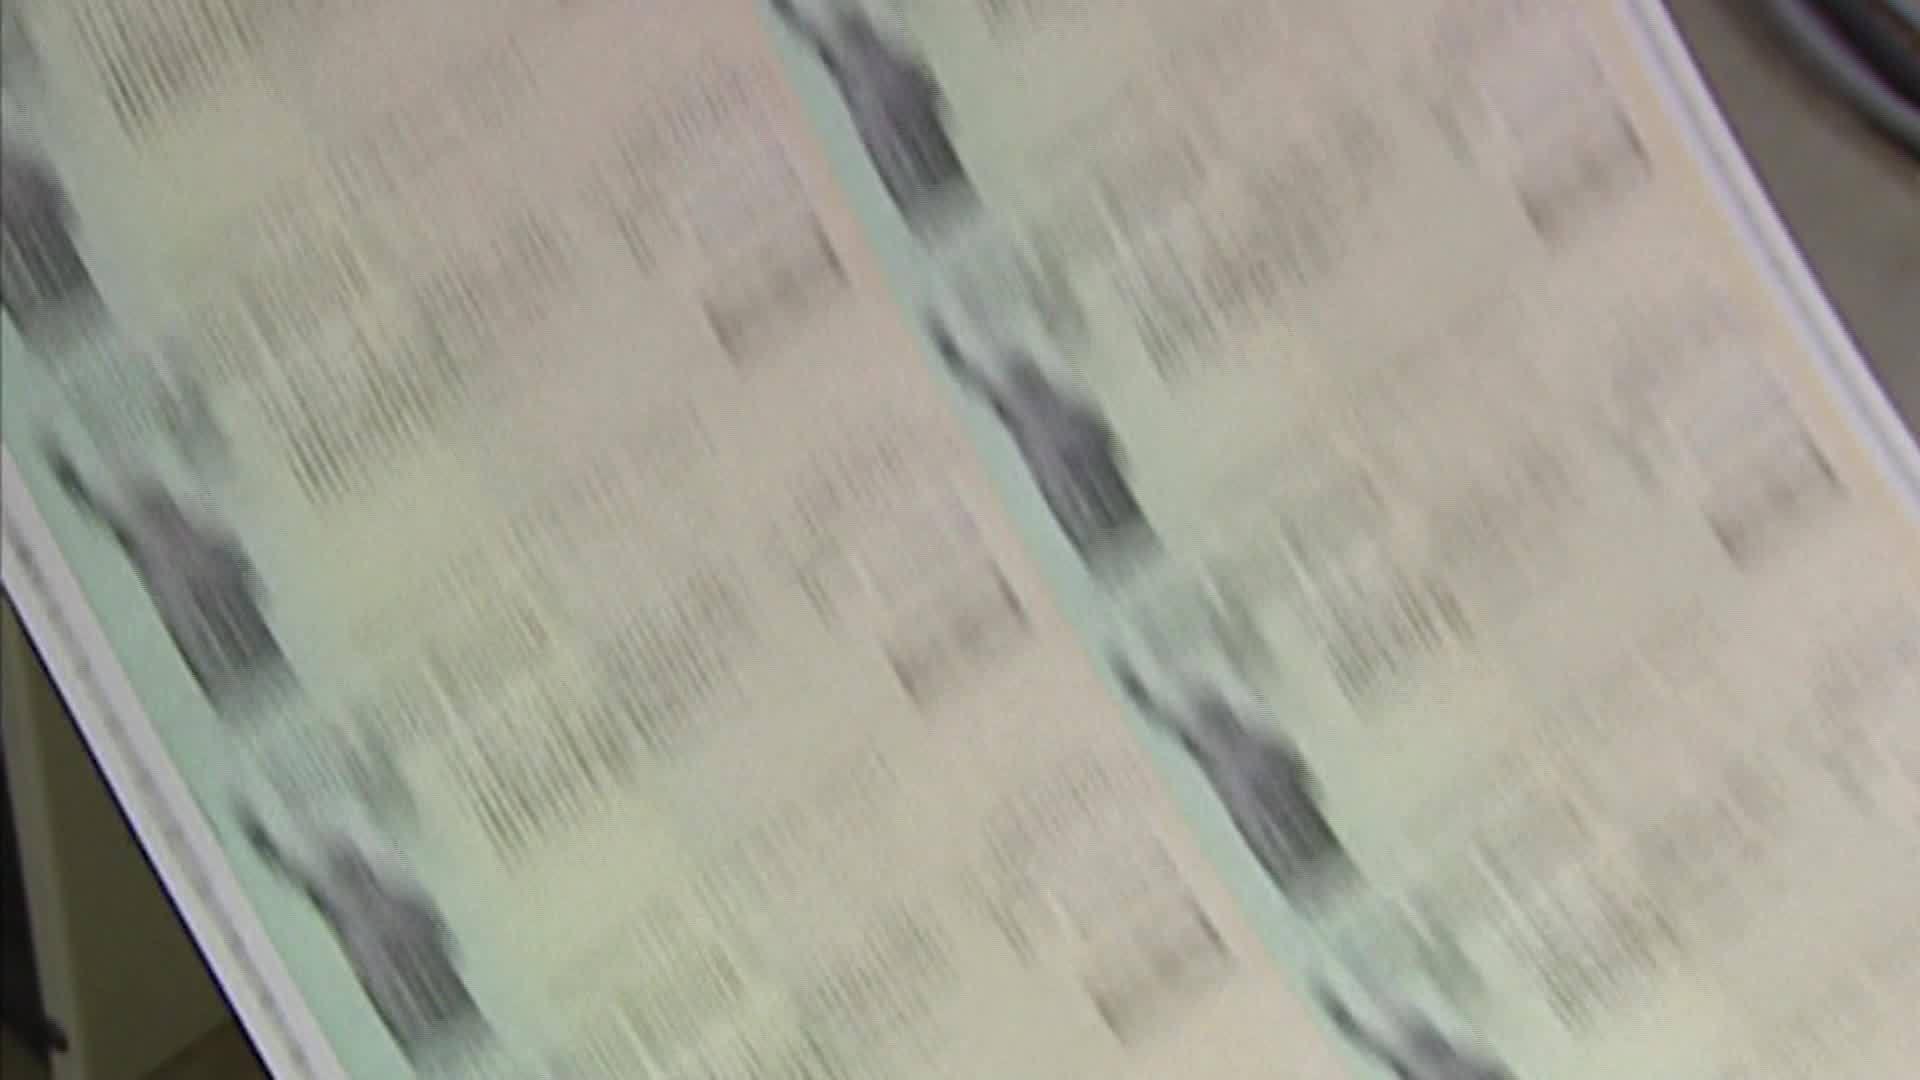 More_tax_returns_7_20190415123653-846653543